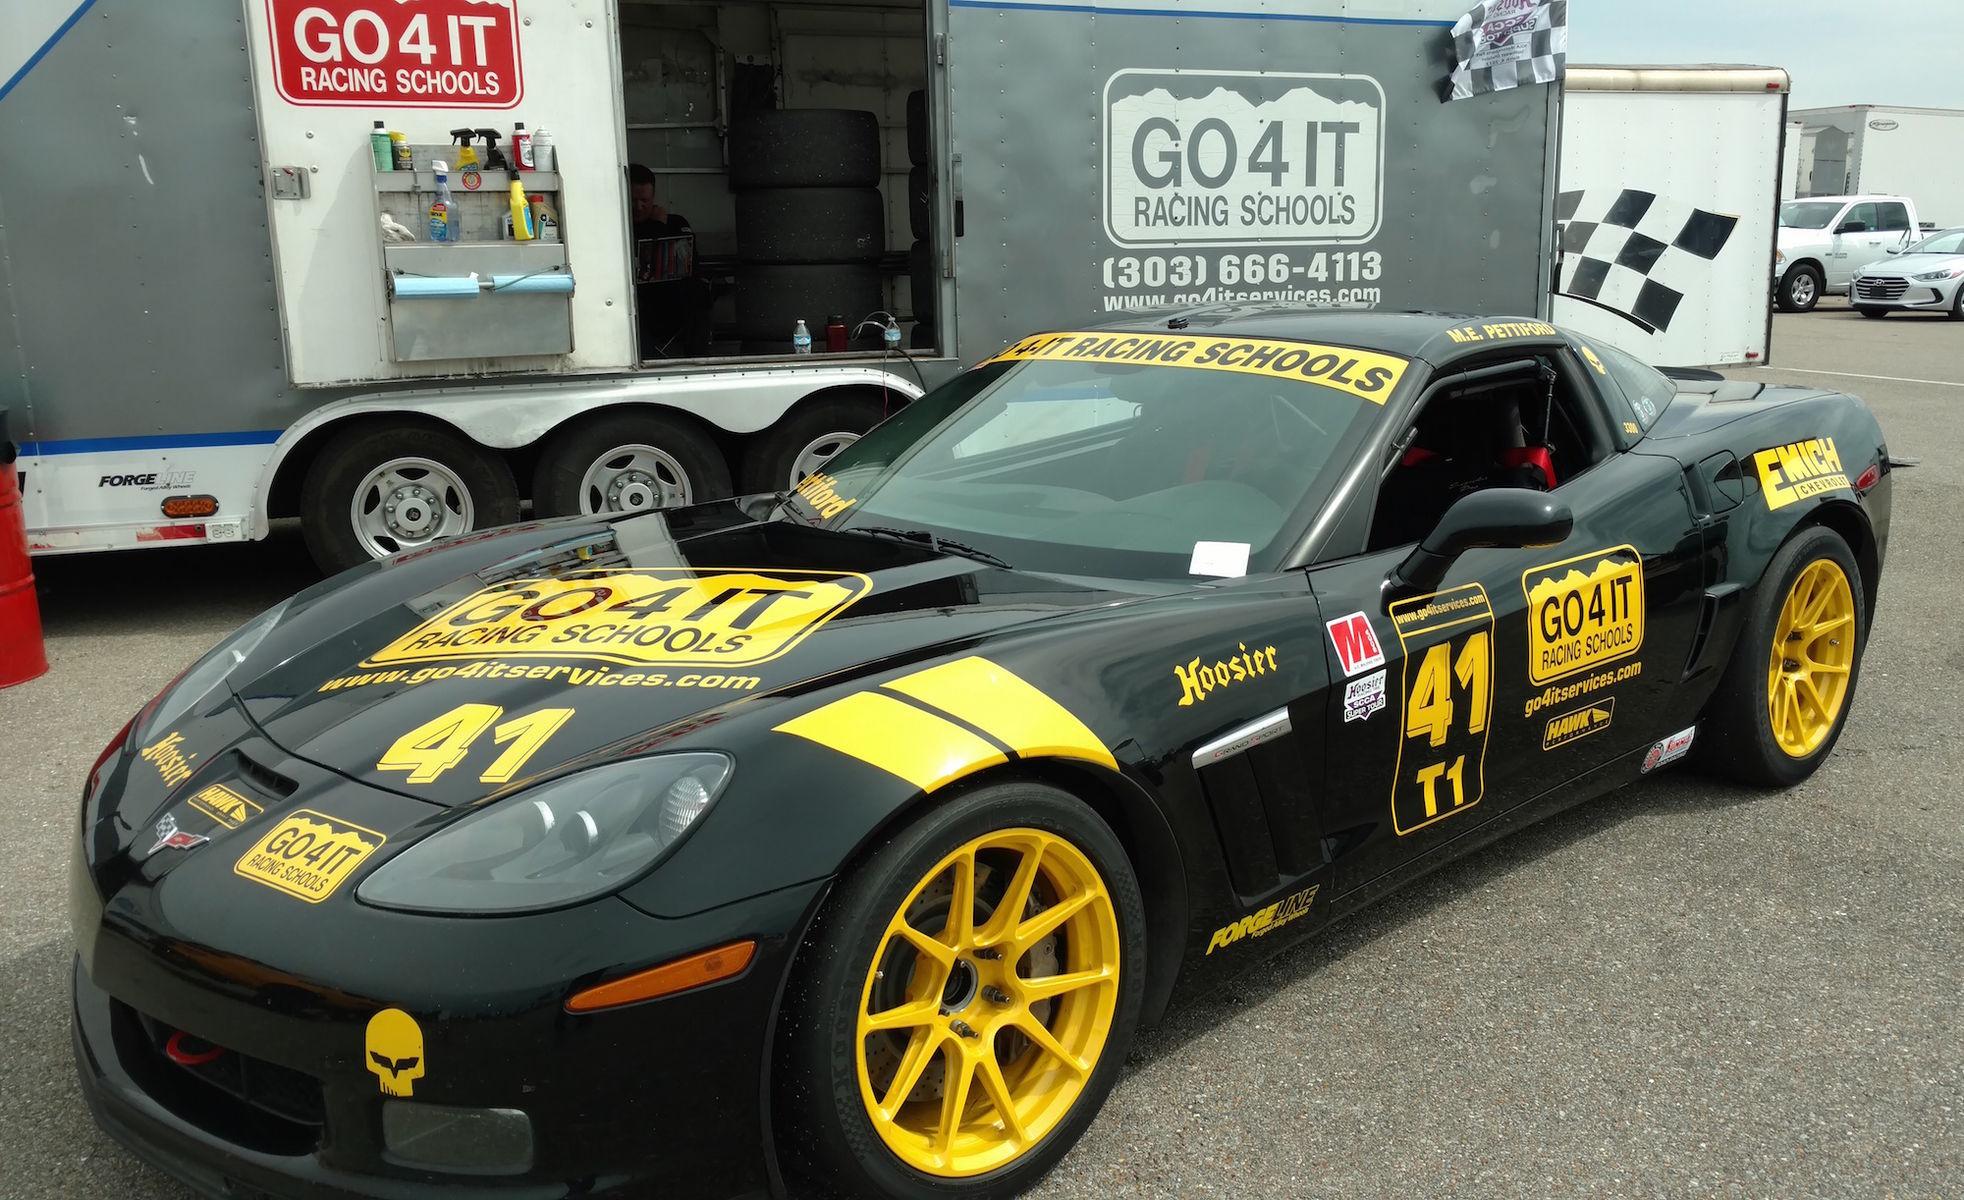 2007 Chevrolet Corvette Z06 | Mike Pettiford's C6 Z06 on GS1R